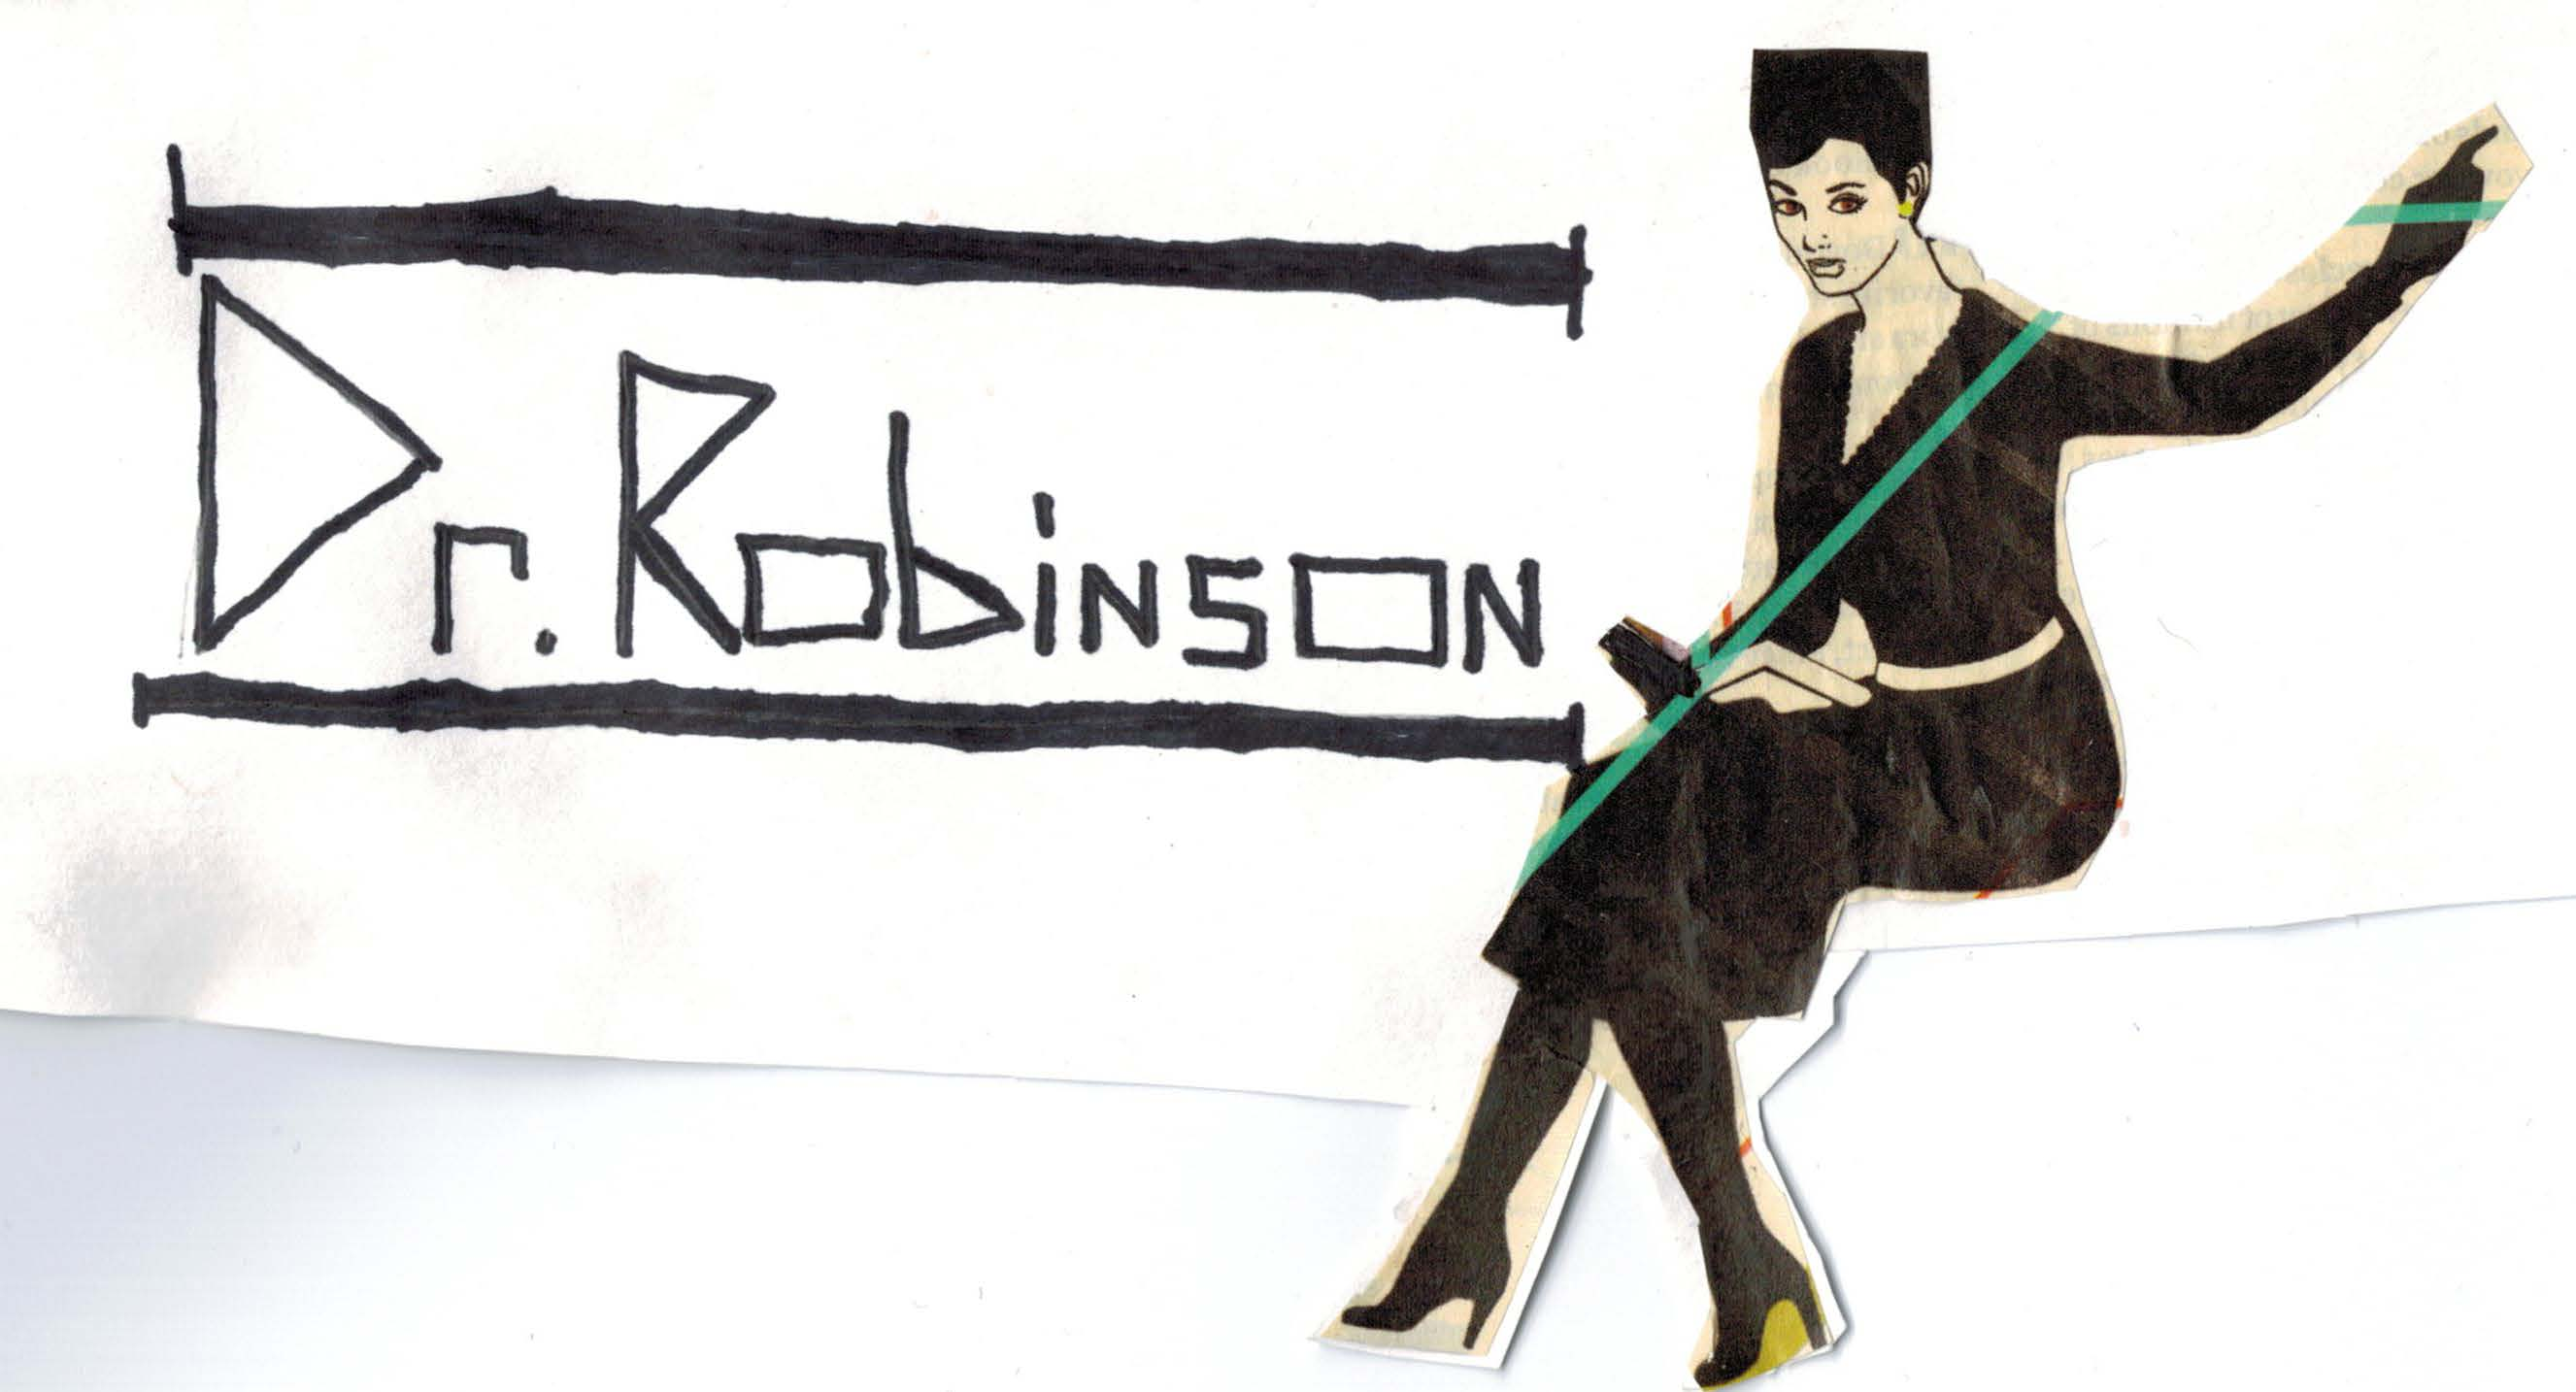 Dr. Robinson